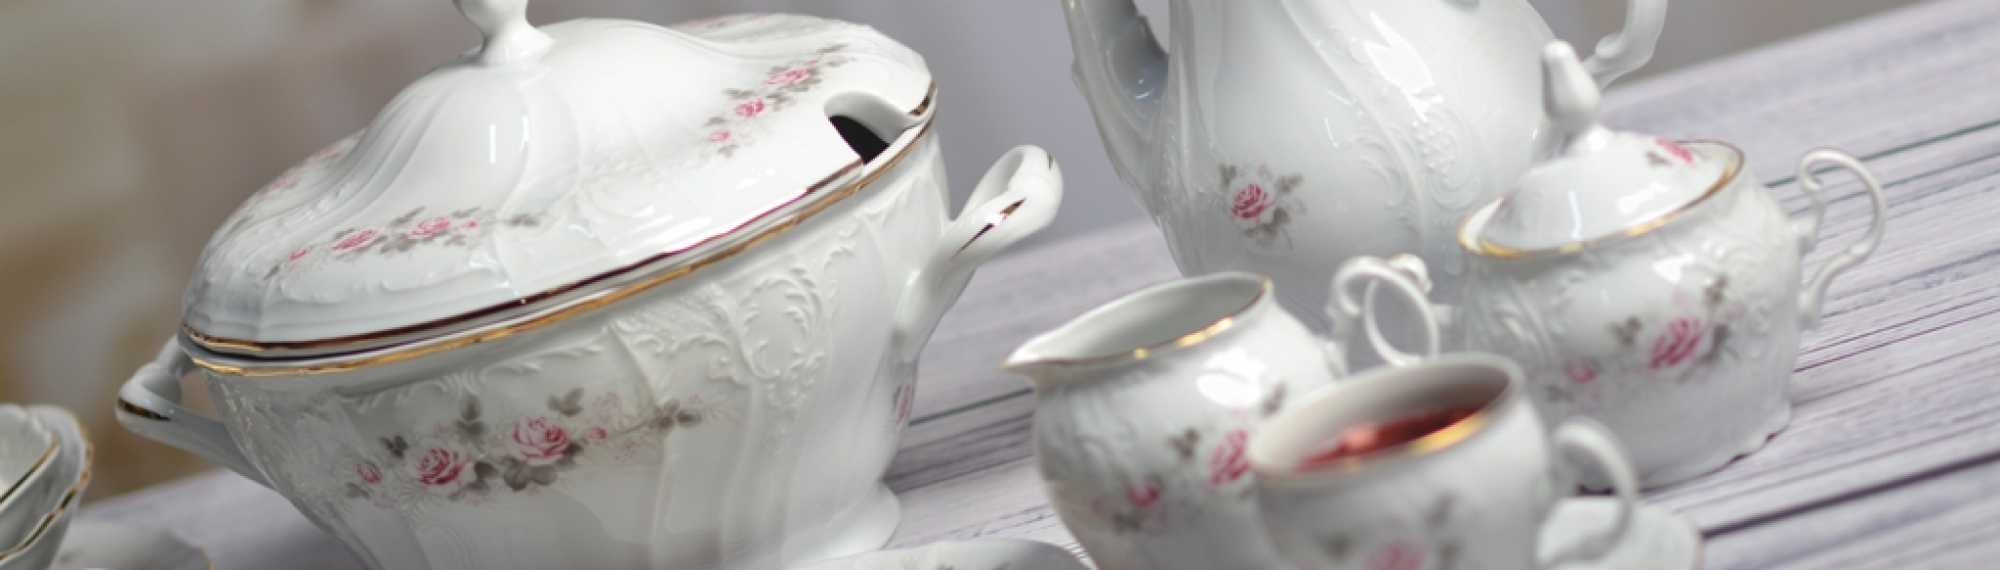 Utility porcelain